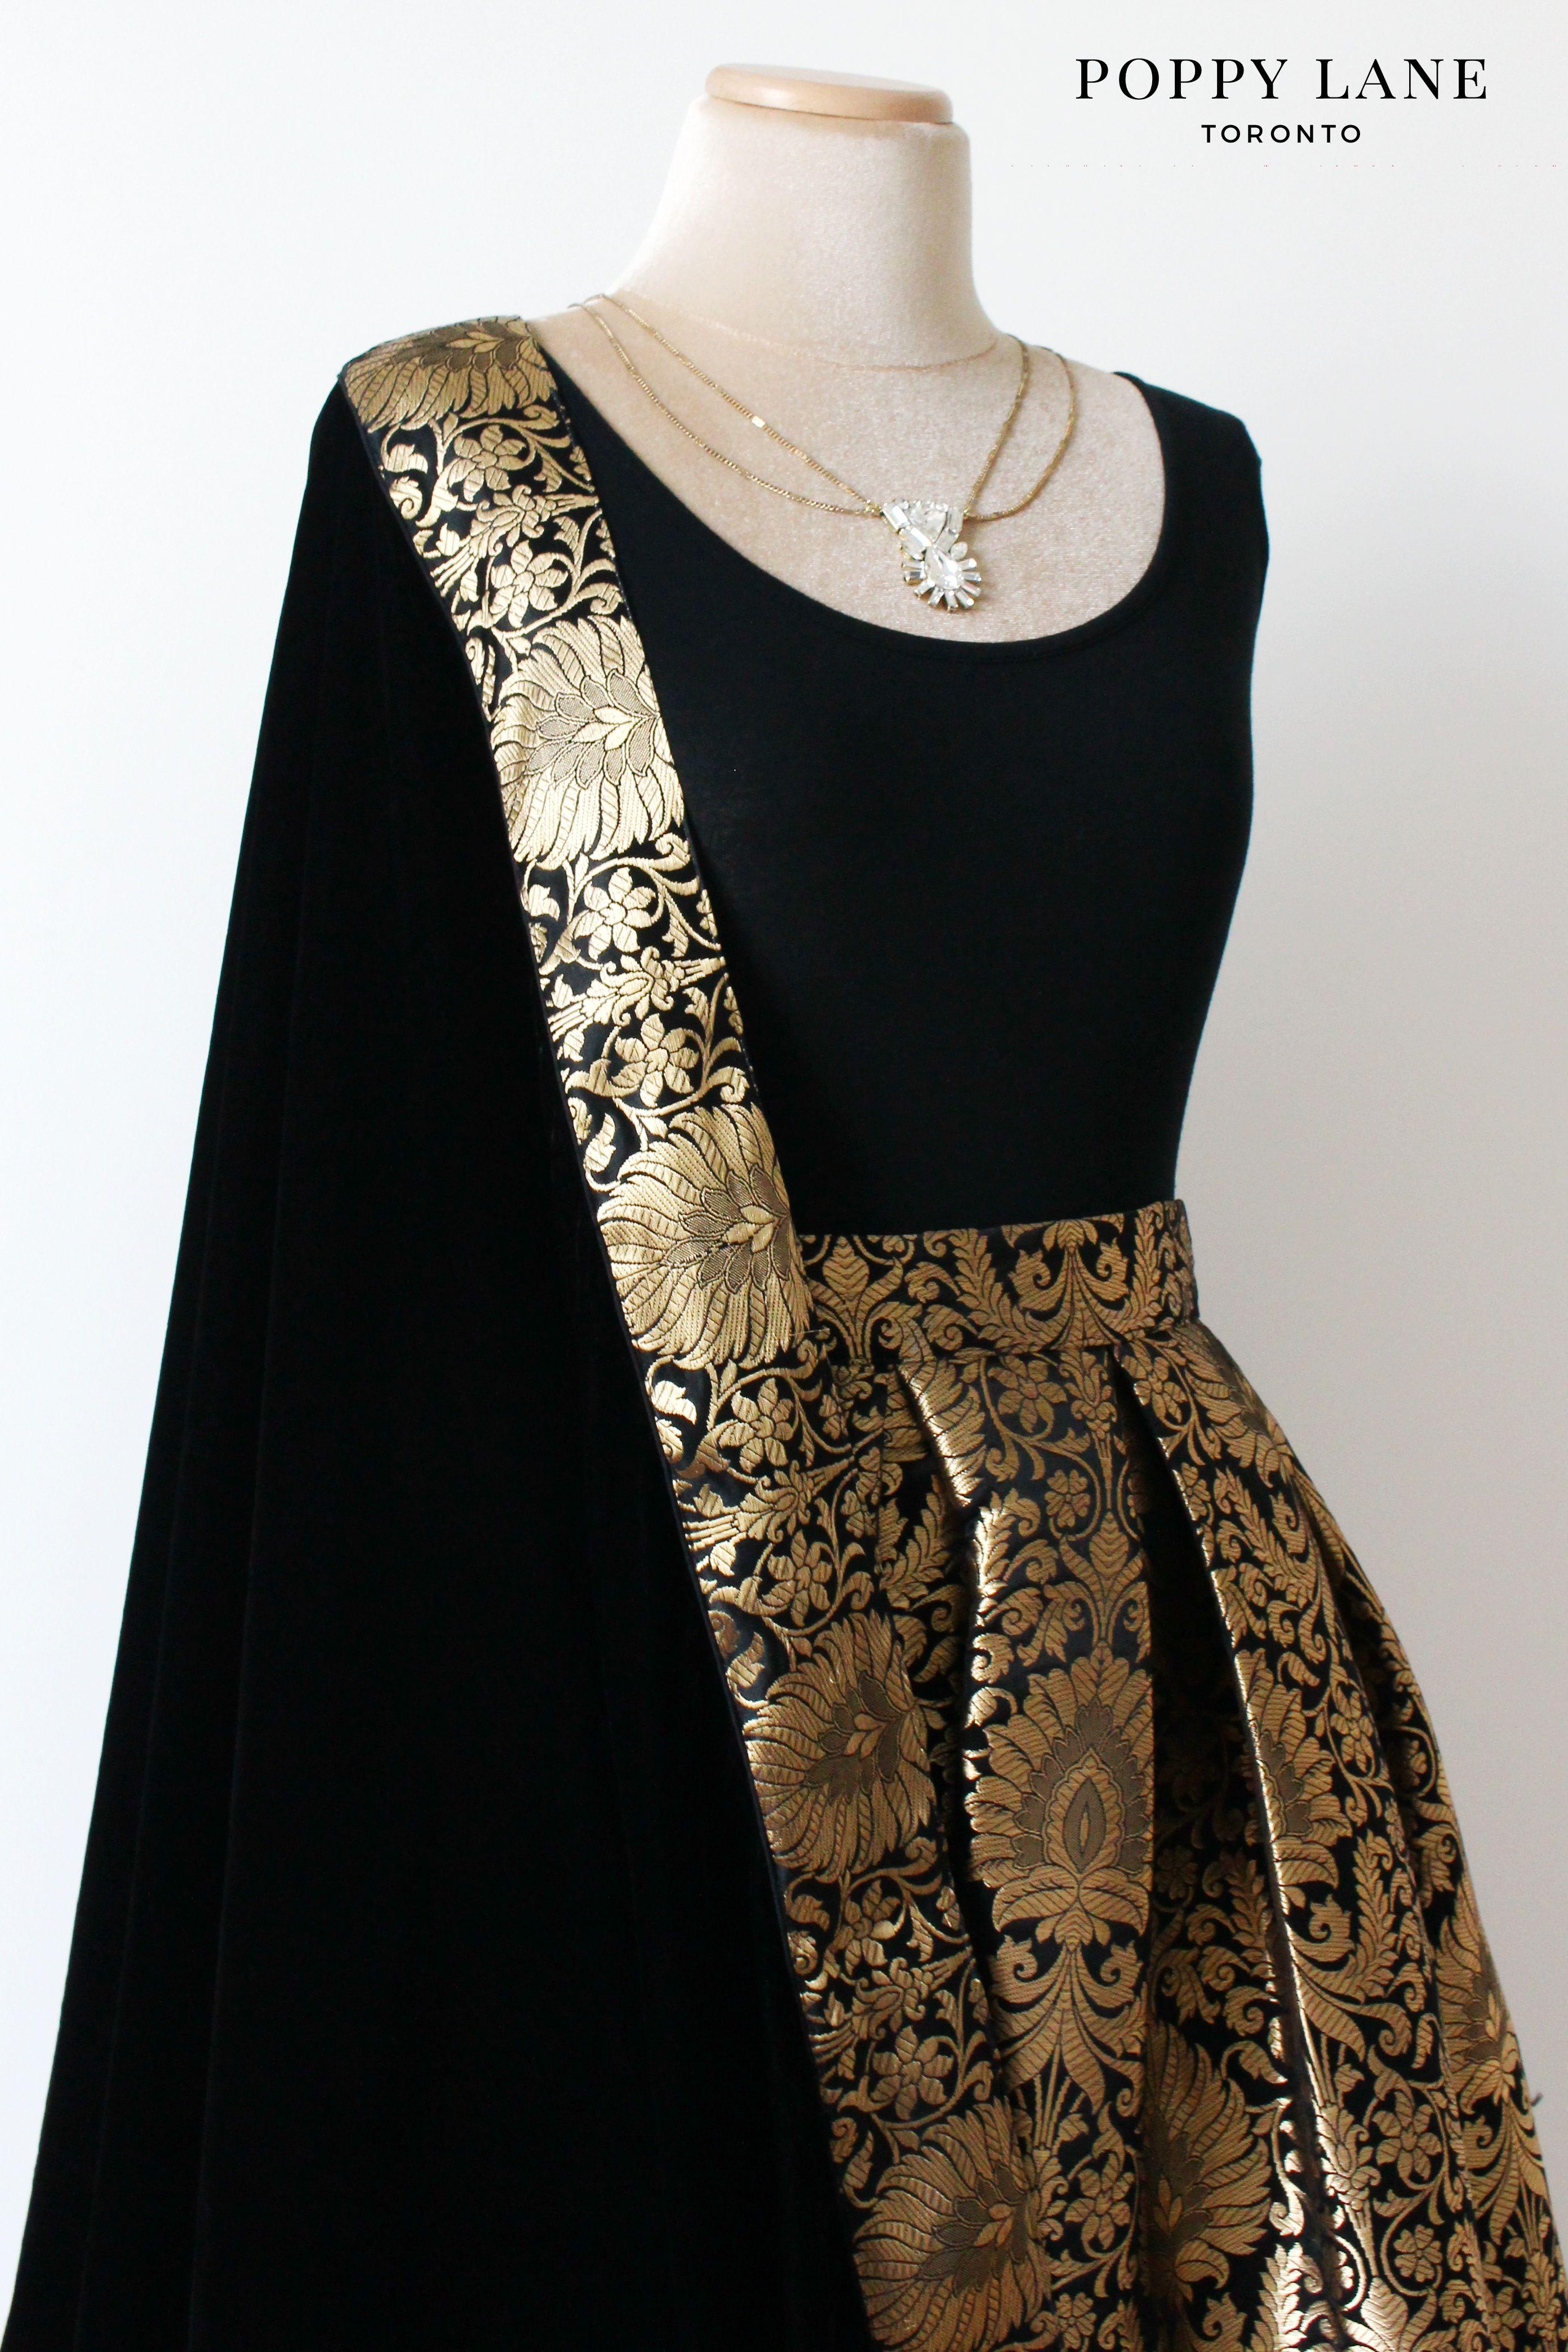 d8faace677 Poppy lane Toronto Simple Black Brocade Skirts with matching velvet  dupattas. Shop now at poppylane.ca